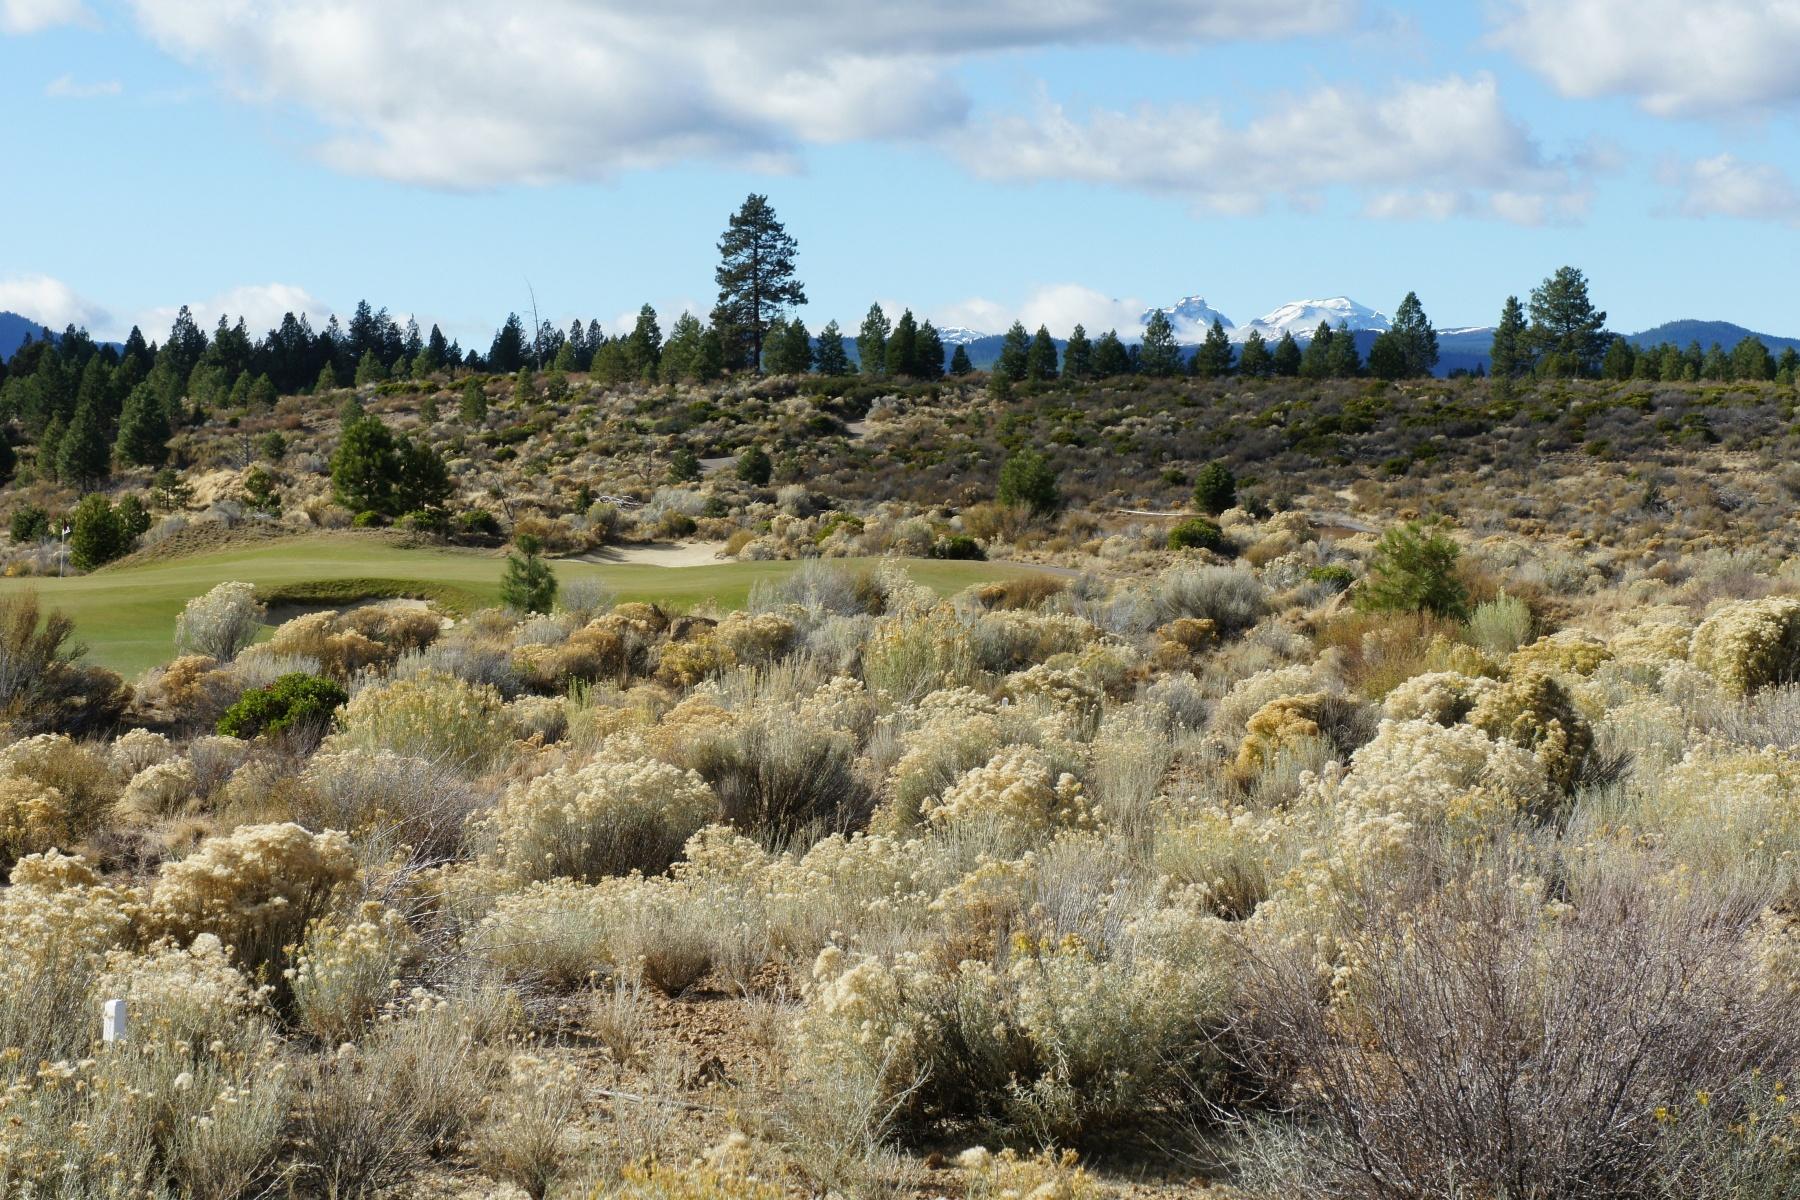 Terreno para Venda às Premium Tetherow Lot 61535 Hardin Martin Ct Lot 205 Bend, Oregon, 97702 Estados Unidos